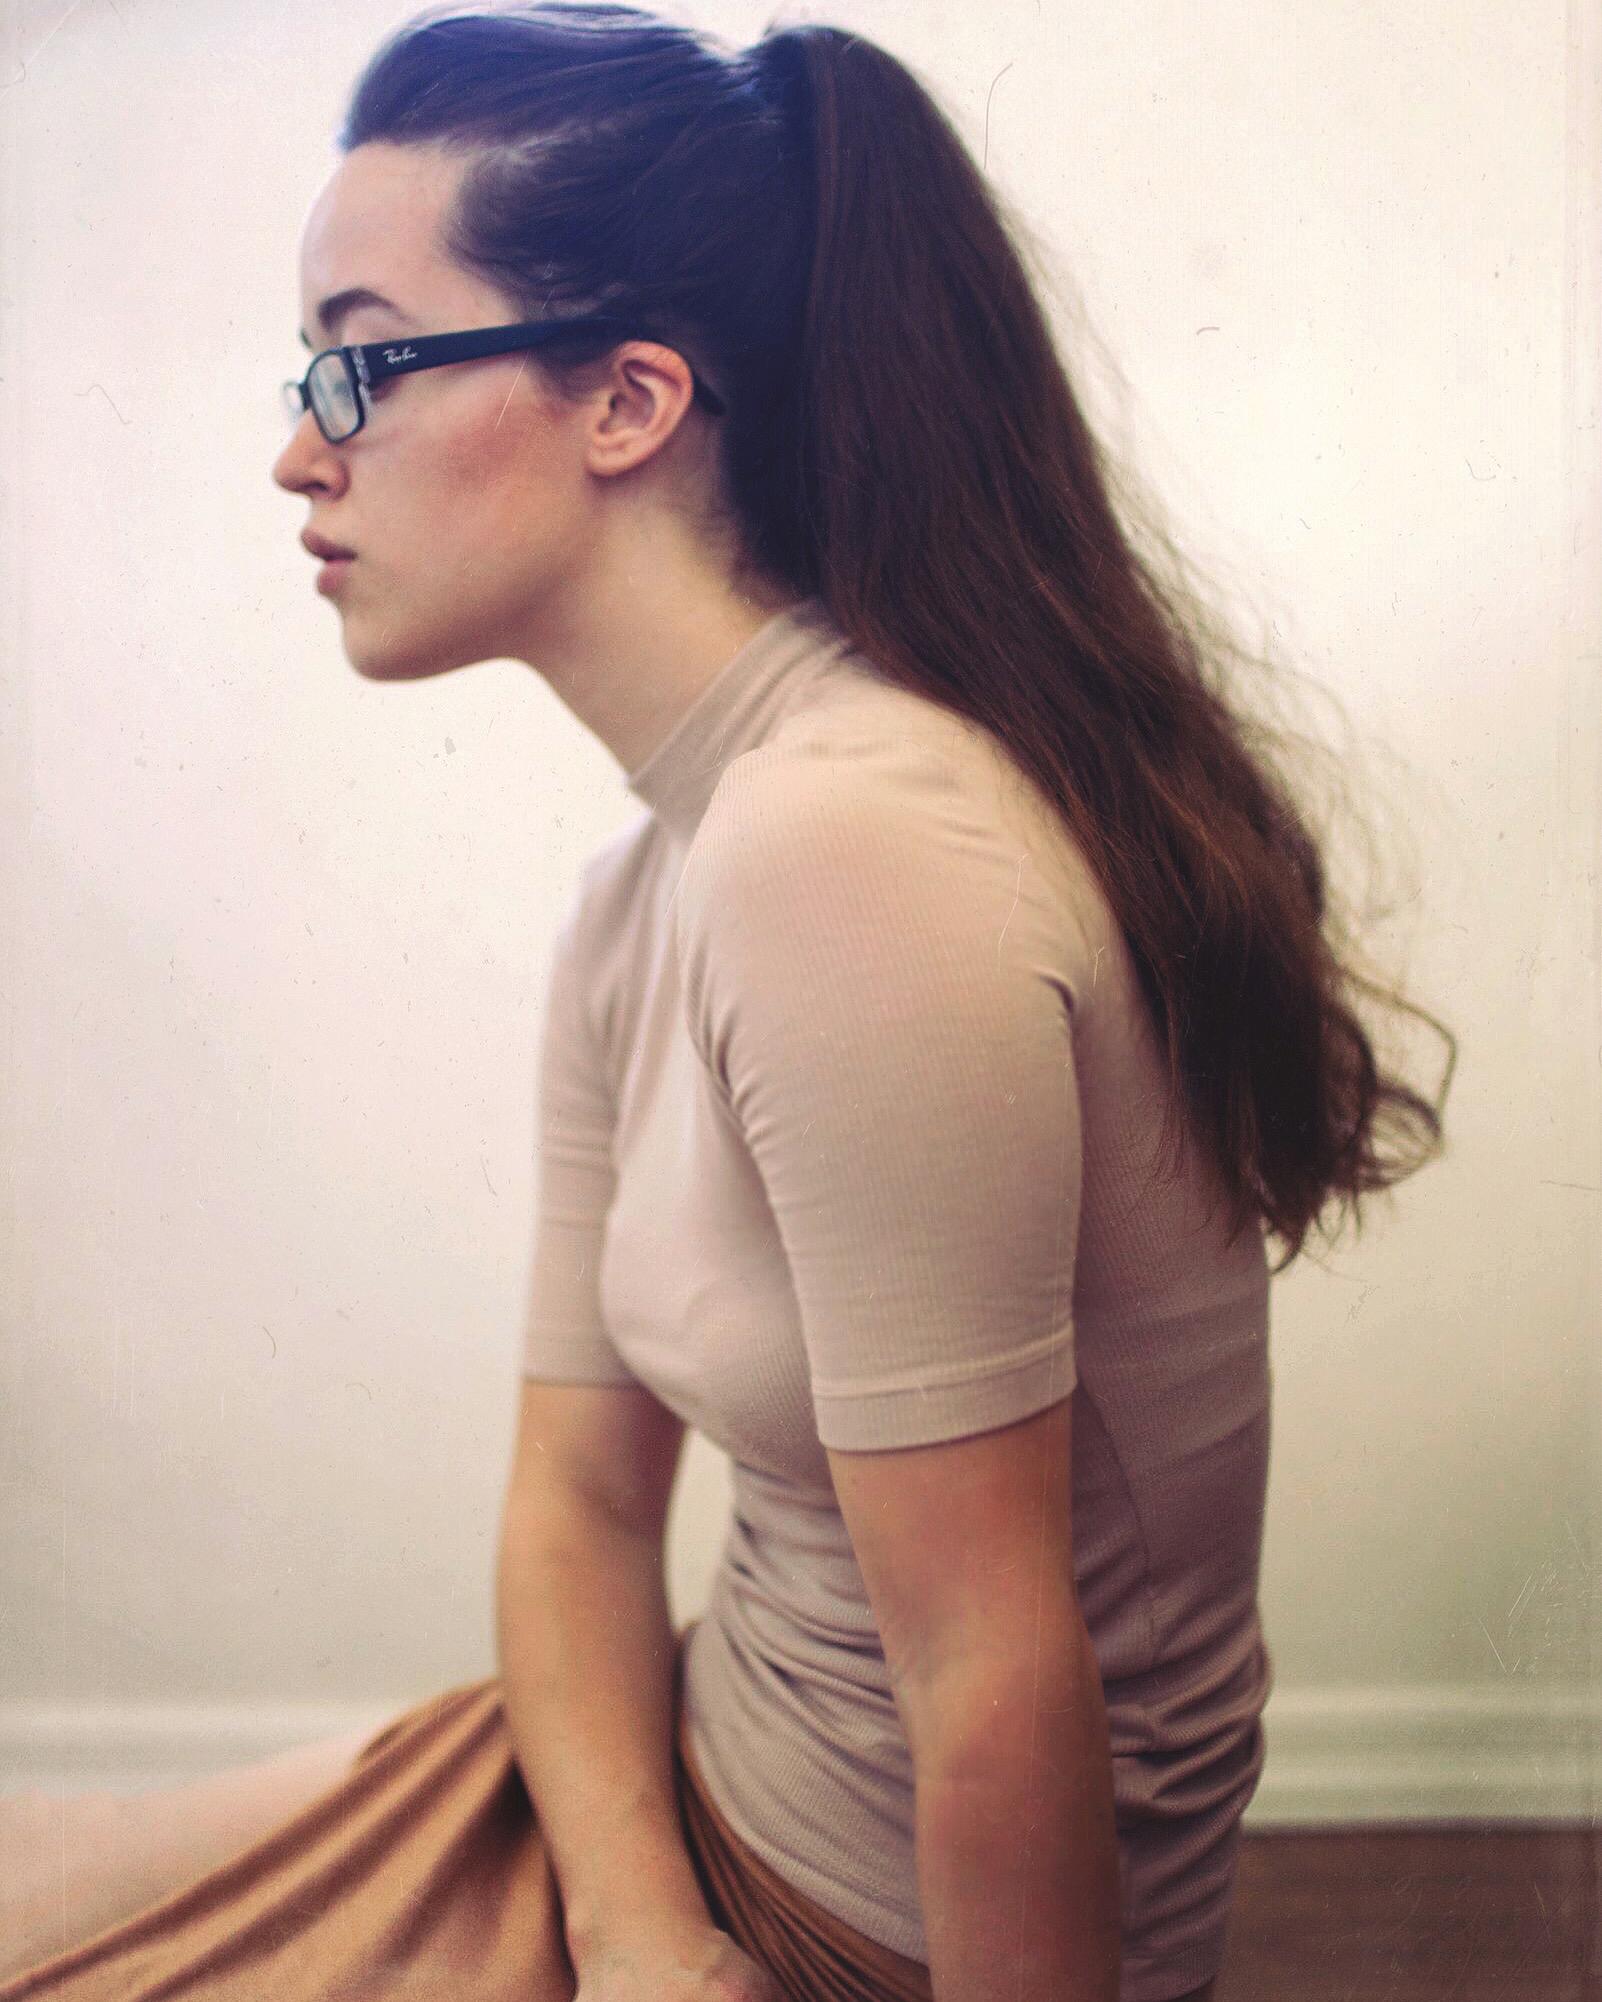 Self portrait, pose, female poses